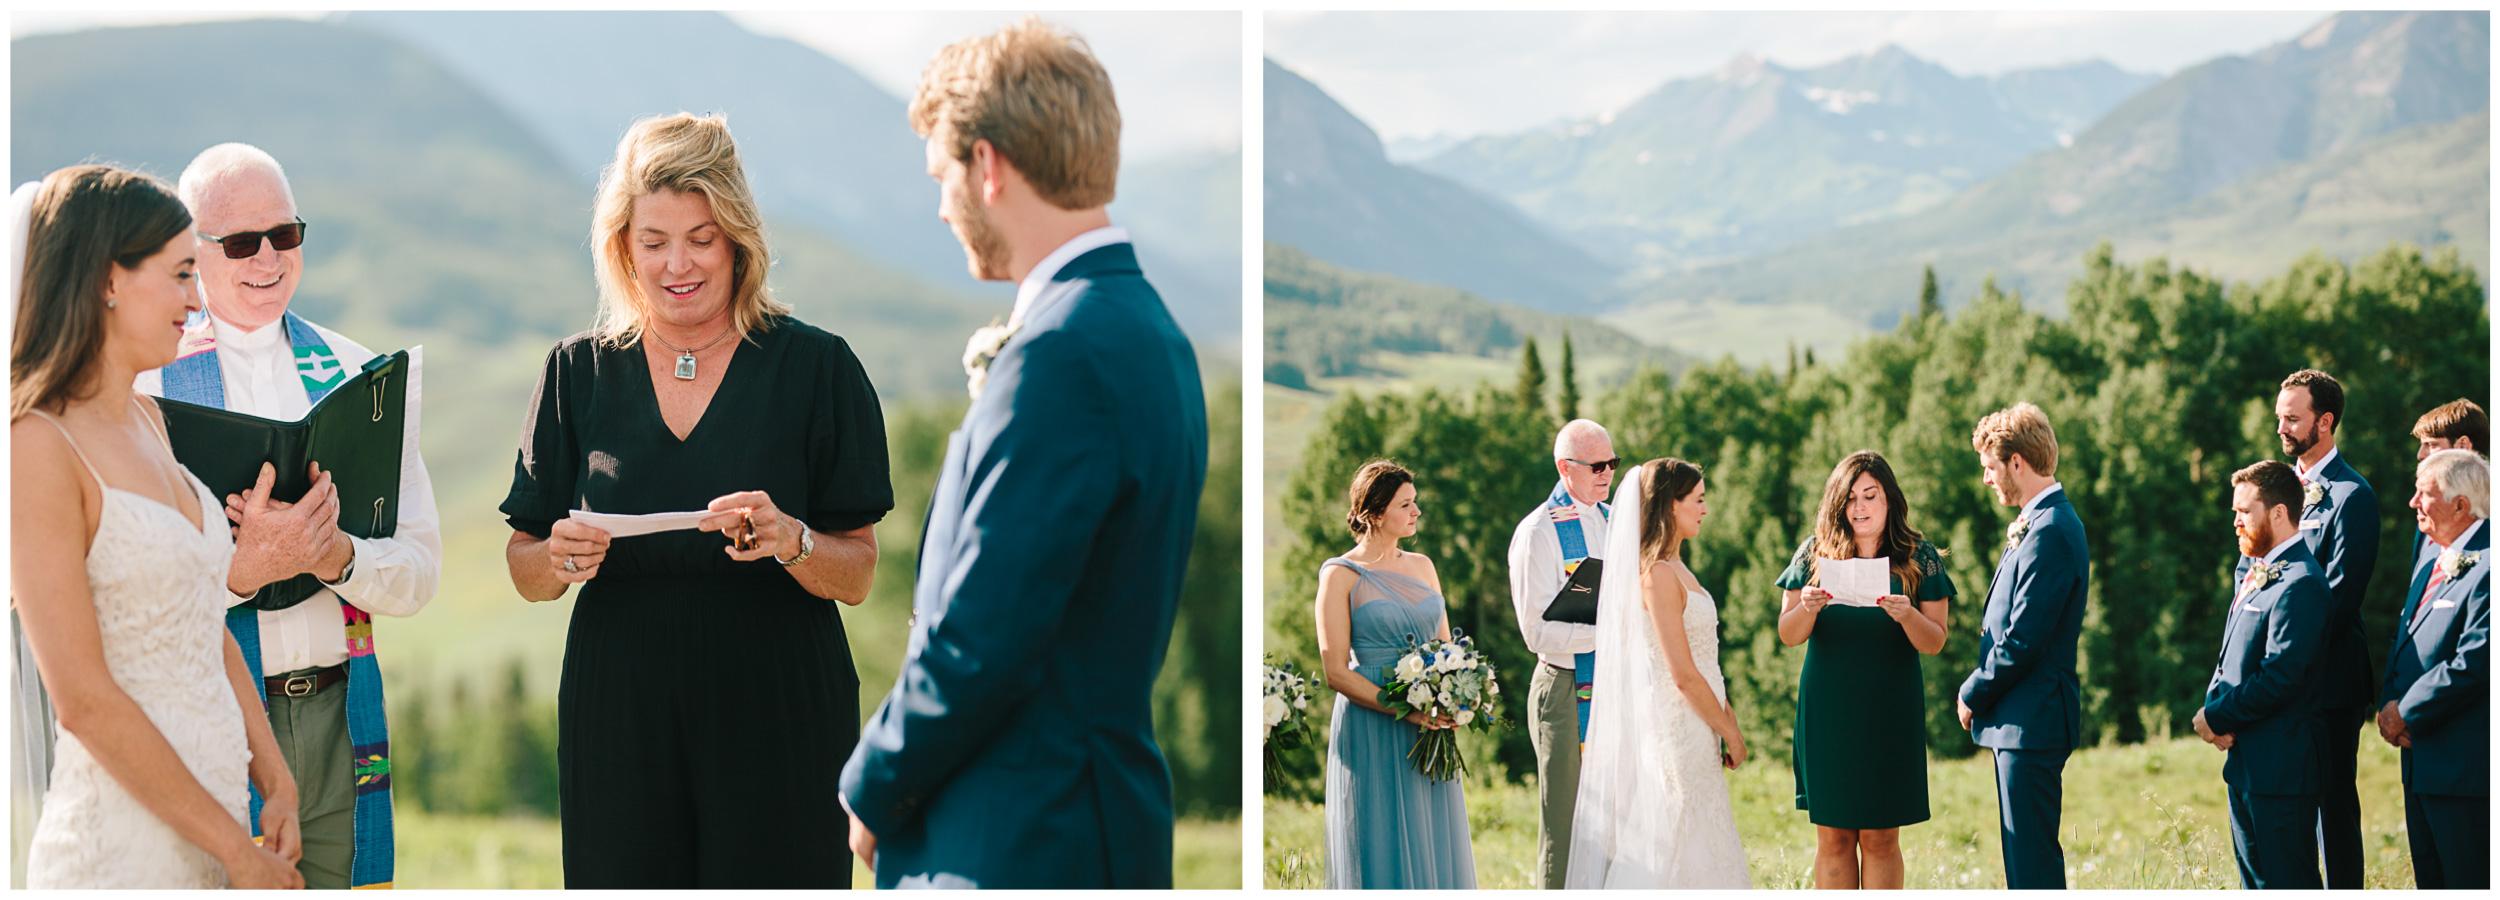 crested_butte_wedding_87.jpg